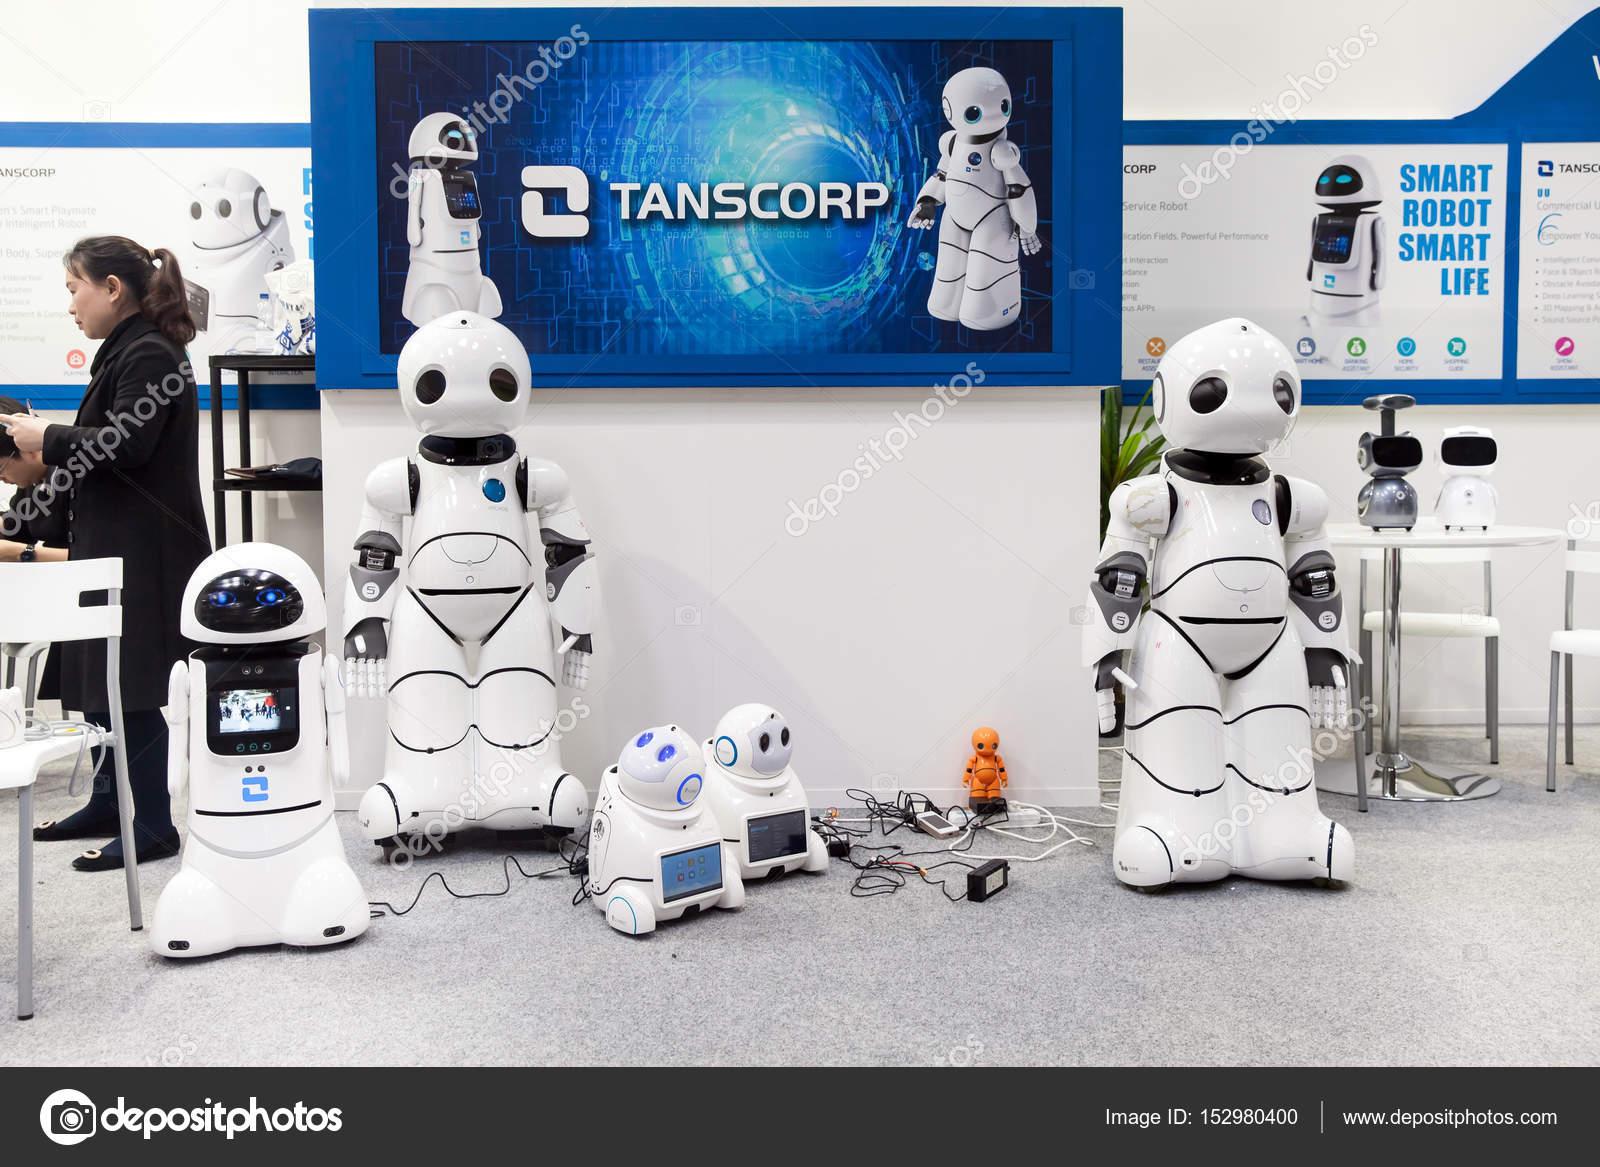 Smart robot UU dancing  Shenzhen Tanscorp technology company